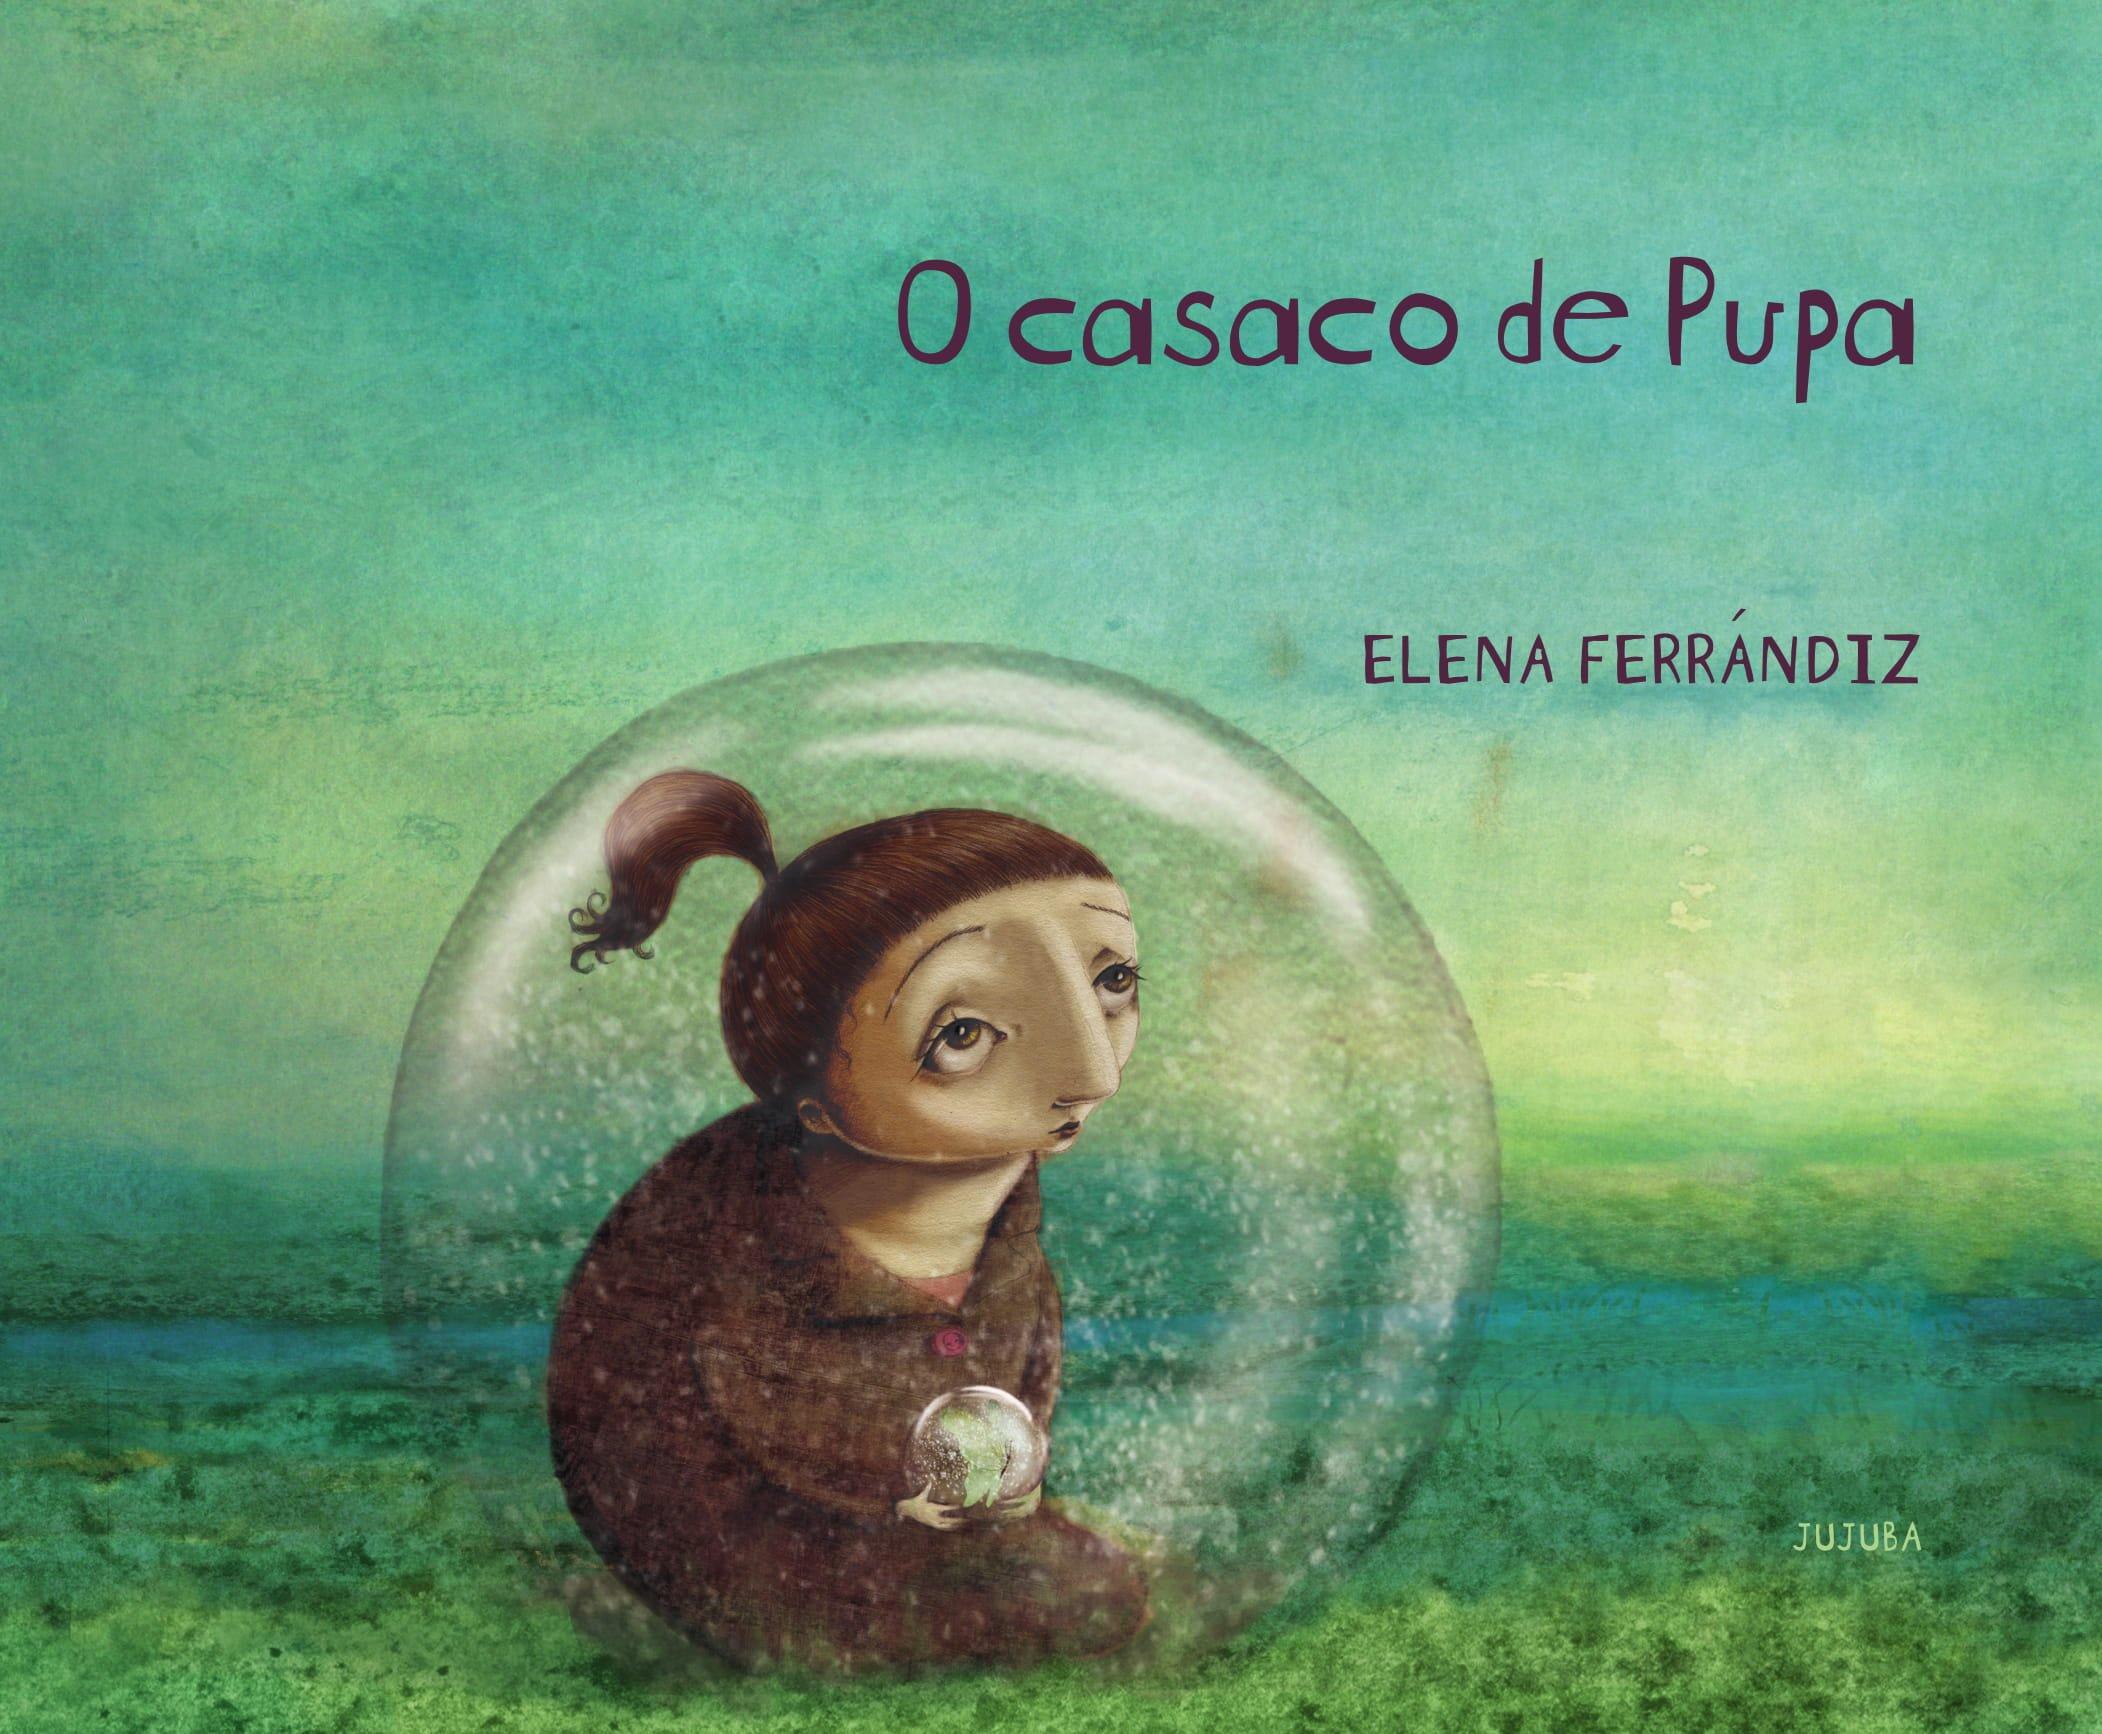 O casaco de Pupa, livro de Elena Ferrándiz